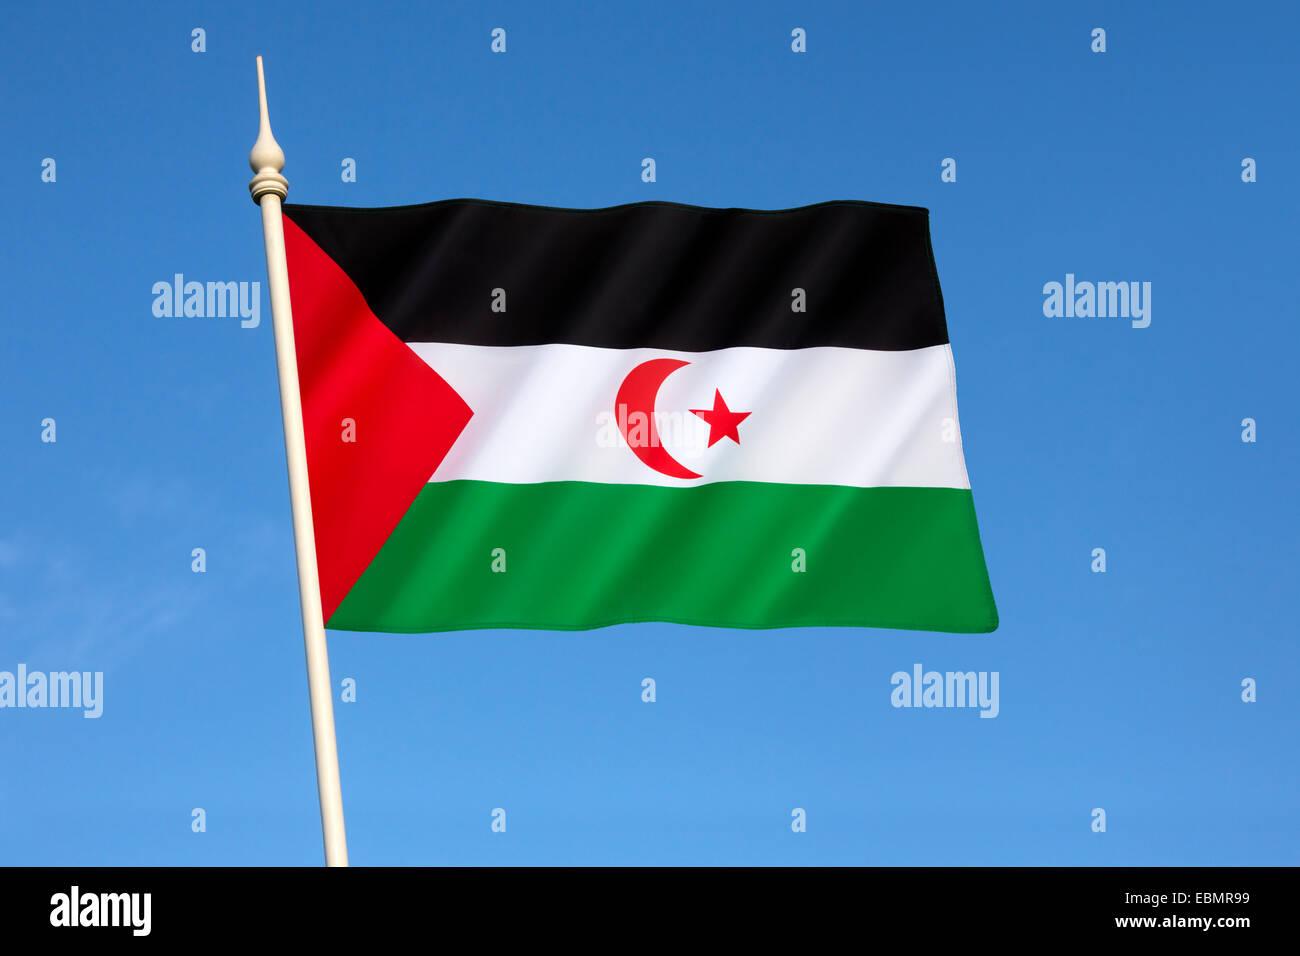 Flag of the Sahrawi Arab Democratic Republic - Western Sahara - Stock Image